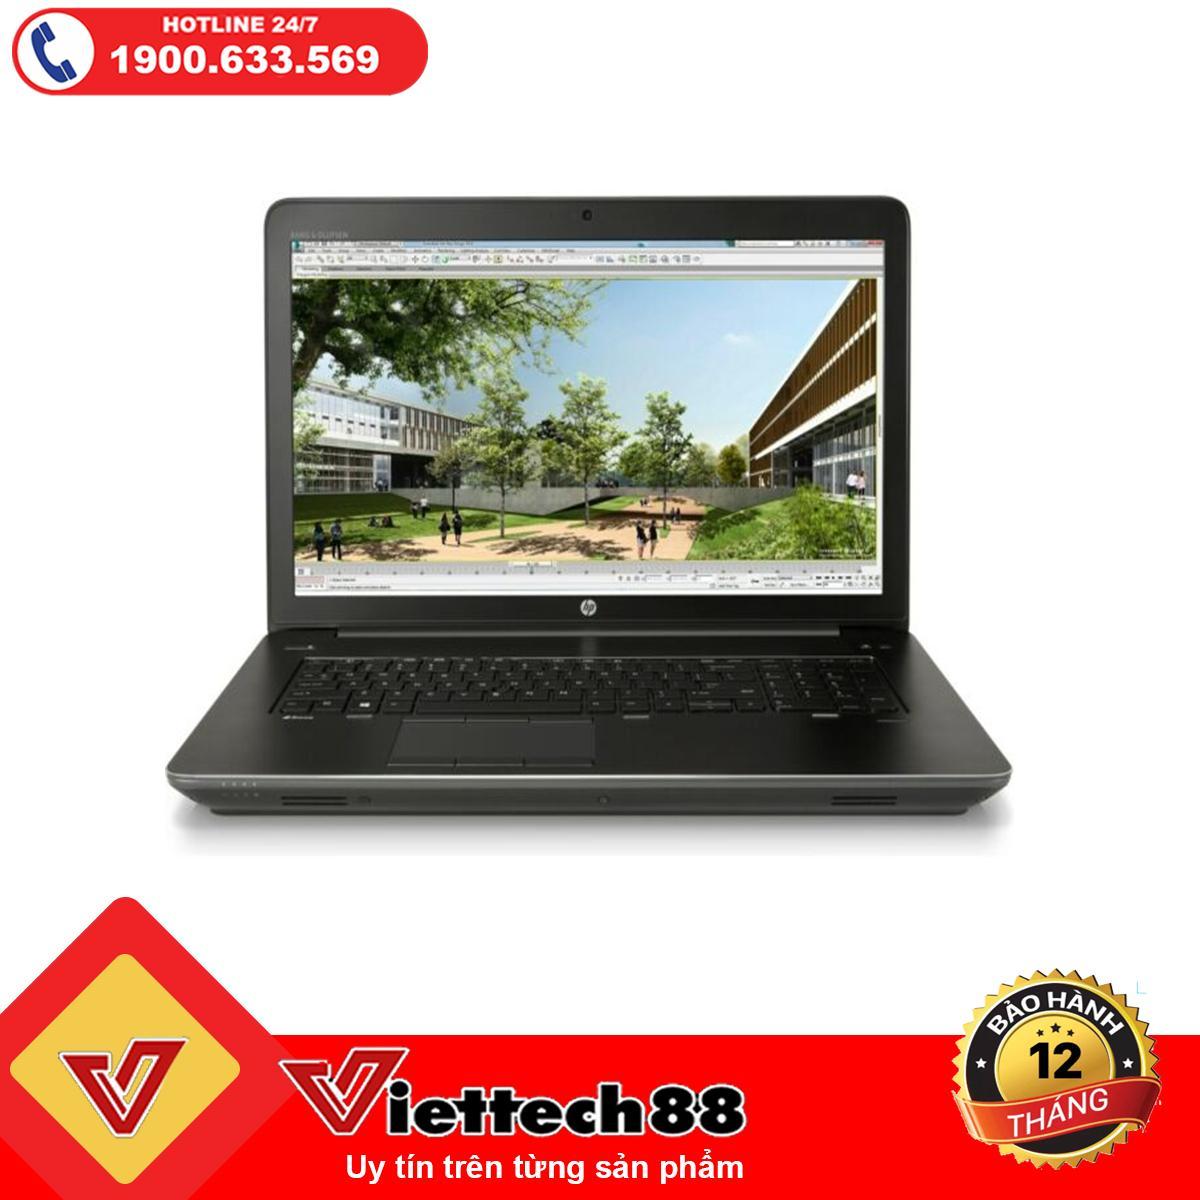 "Laptop HP Zbook 17 G3 Core I7 6820HQ/ RAM 16GB/ SSD 512GB/ VGA M3000M/ Màn 17.3"" FHD Giảm Cực Sốc"